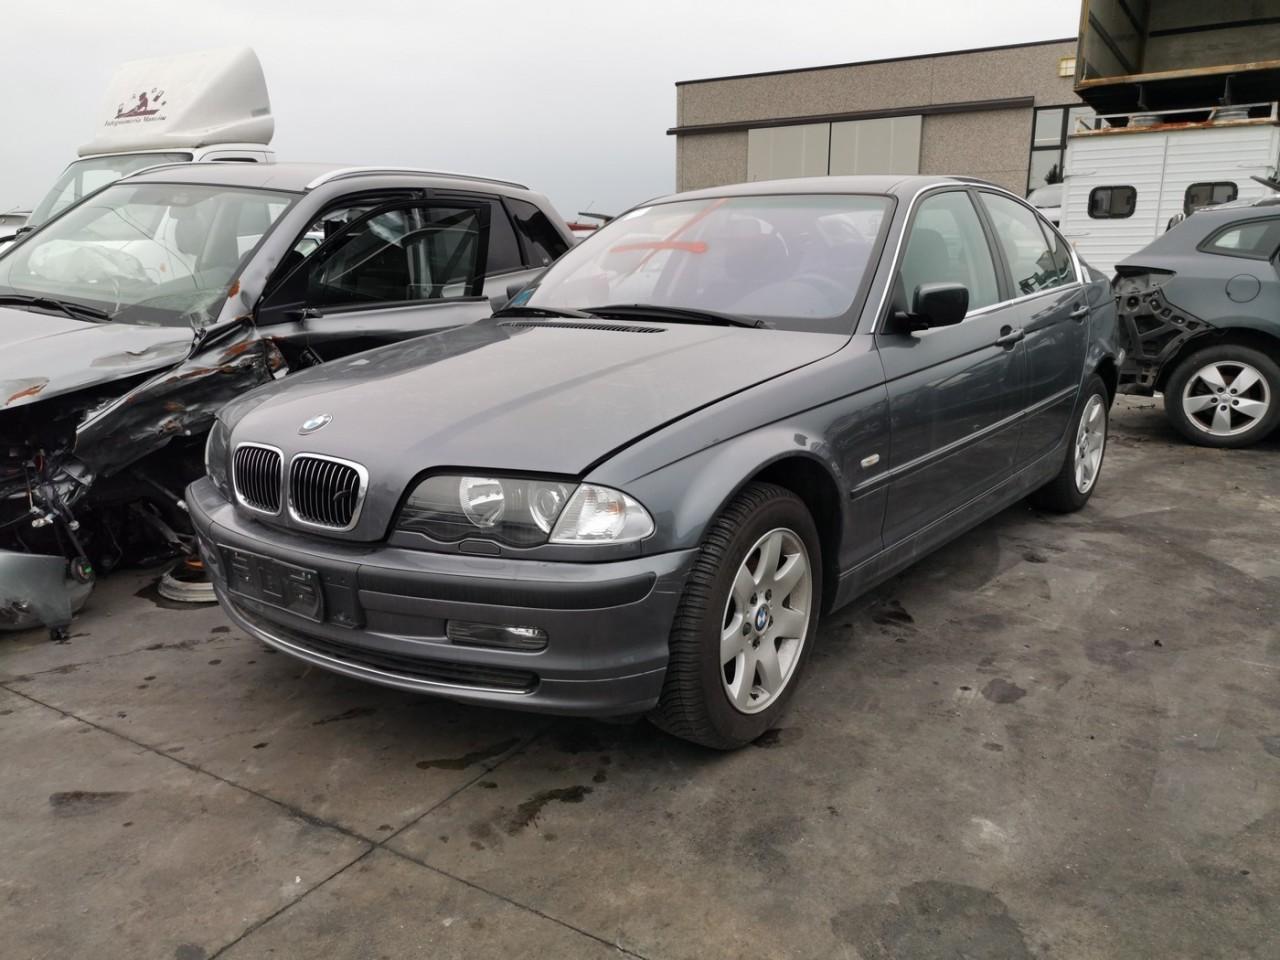 piese second-hand pentru BMW 320i E46  motor 226S1 170cp